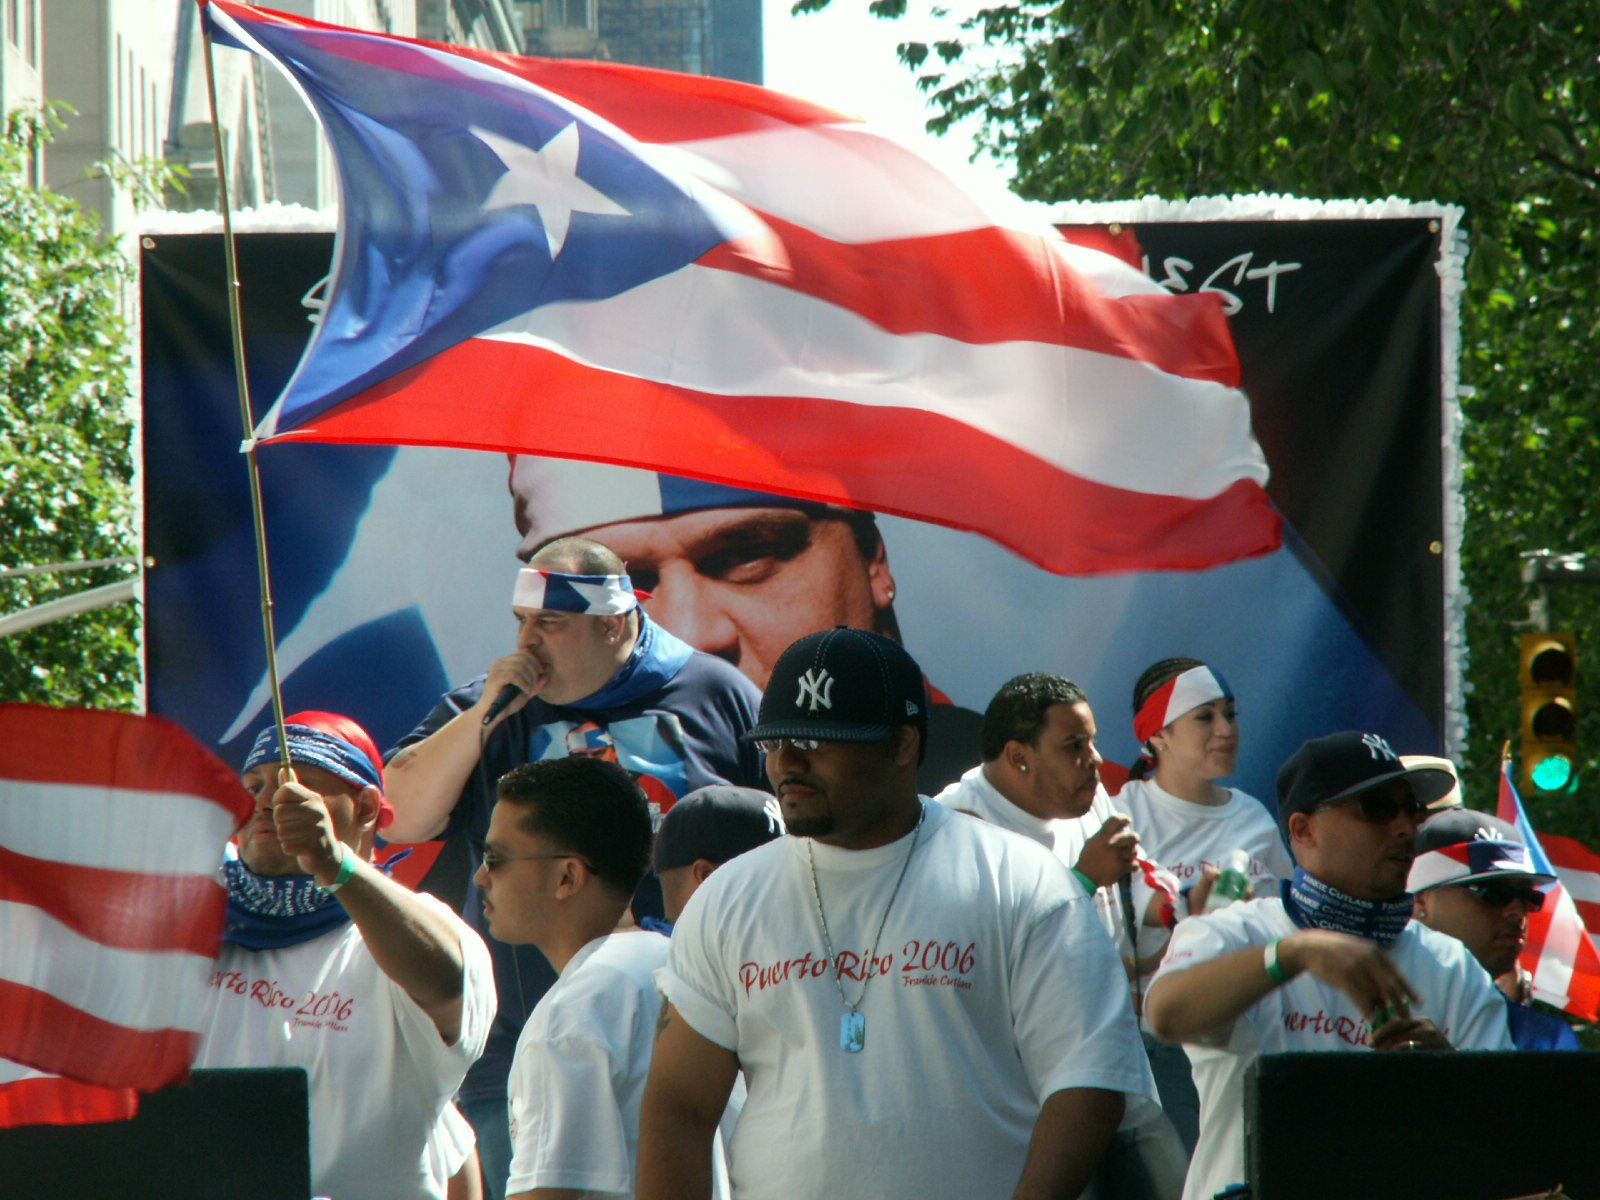 Puerto Rican Day Parade - Wikipedia